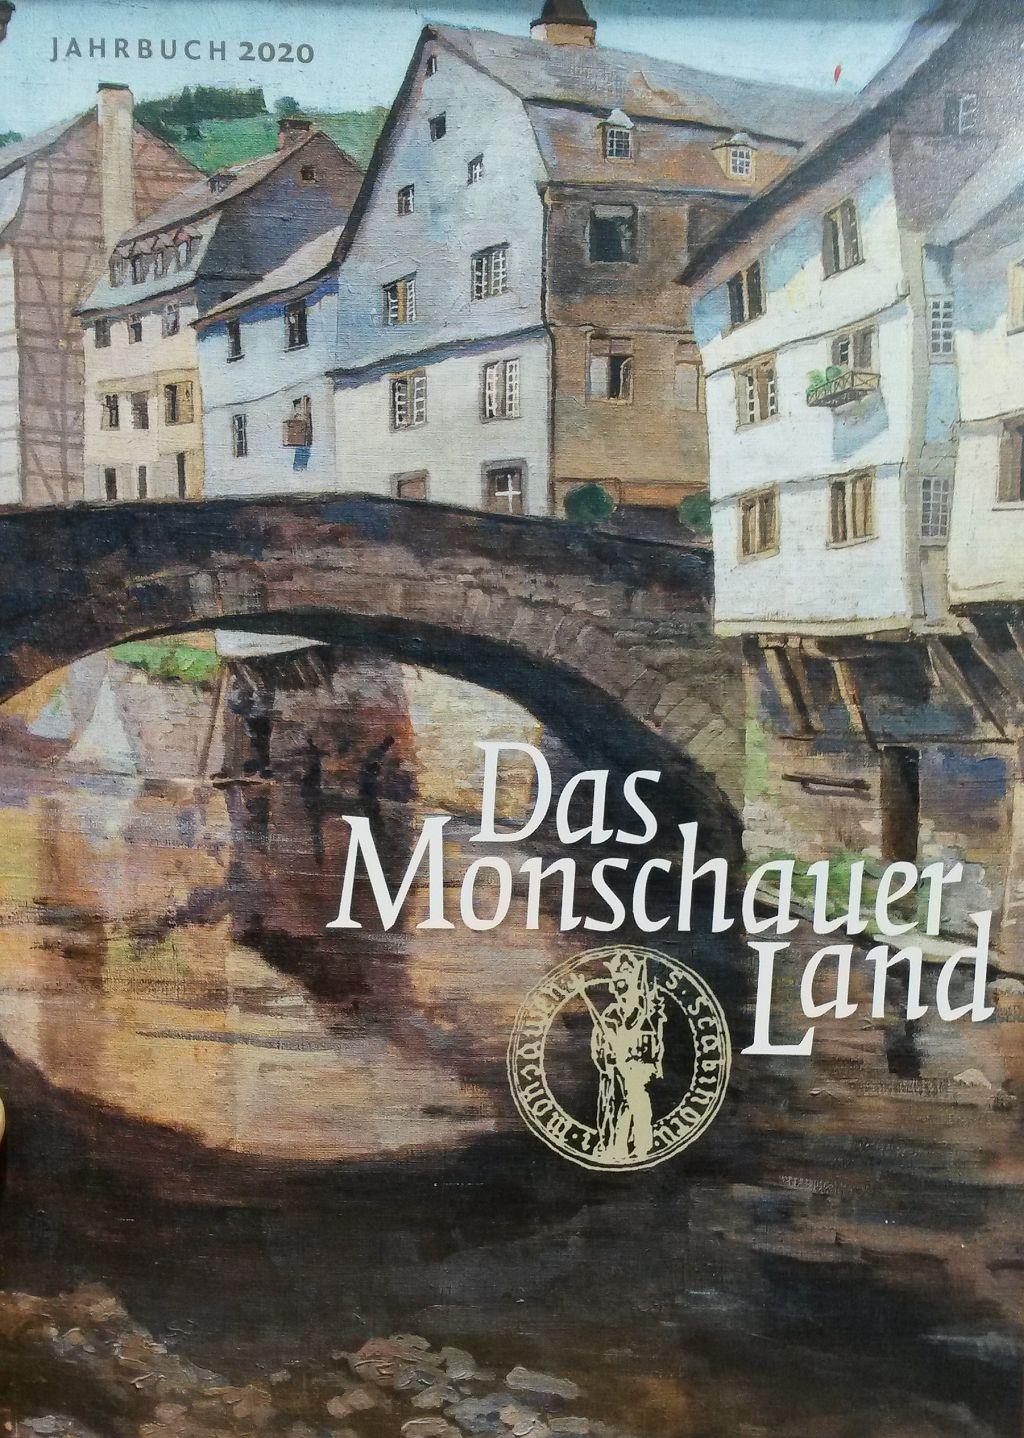 Das Monschauer Land